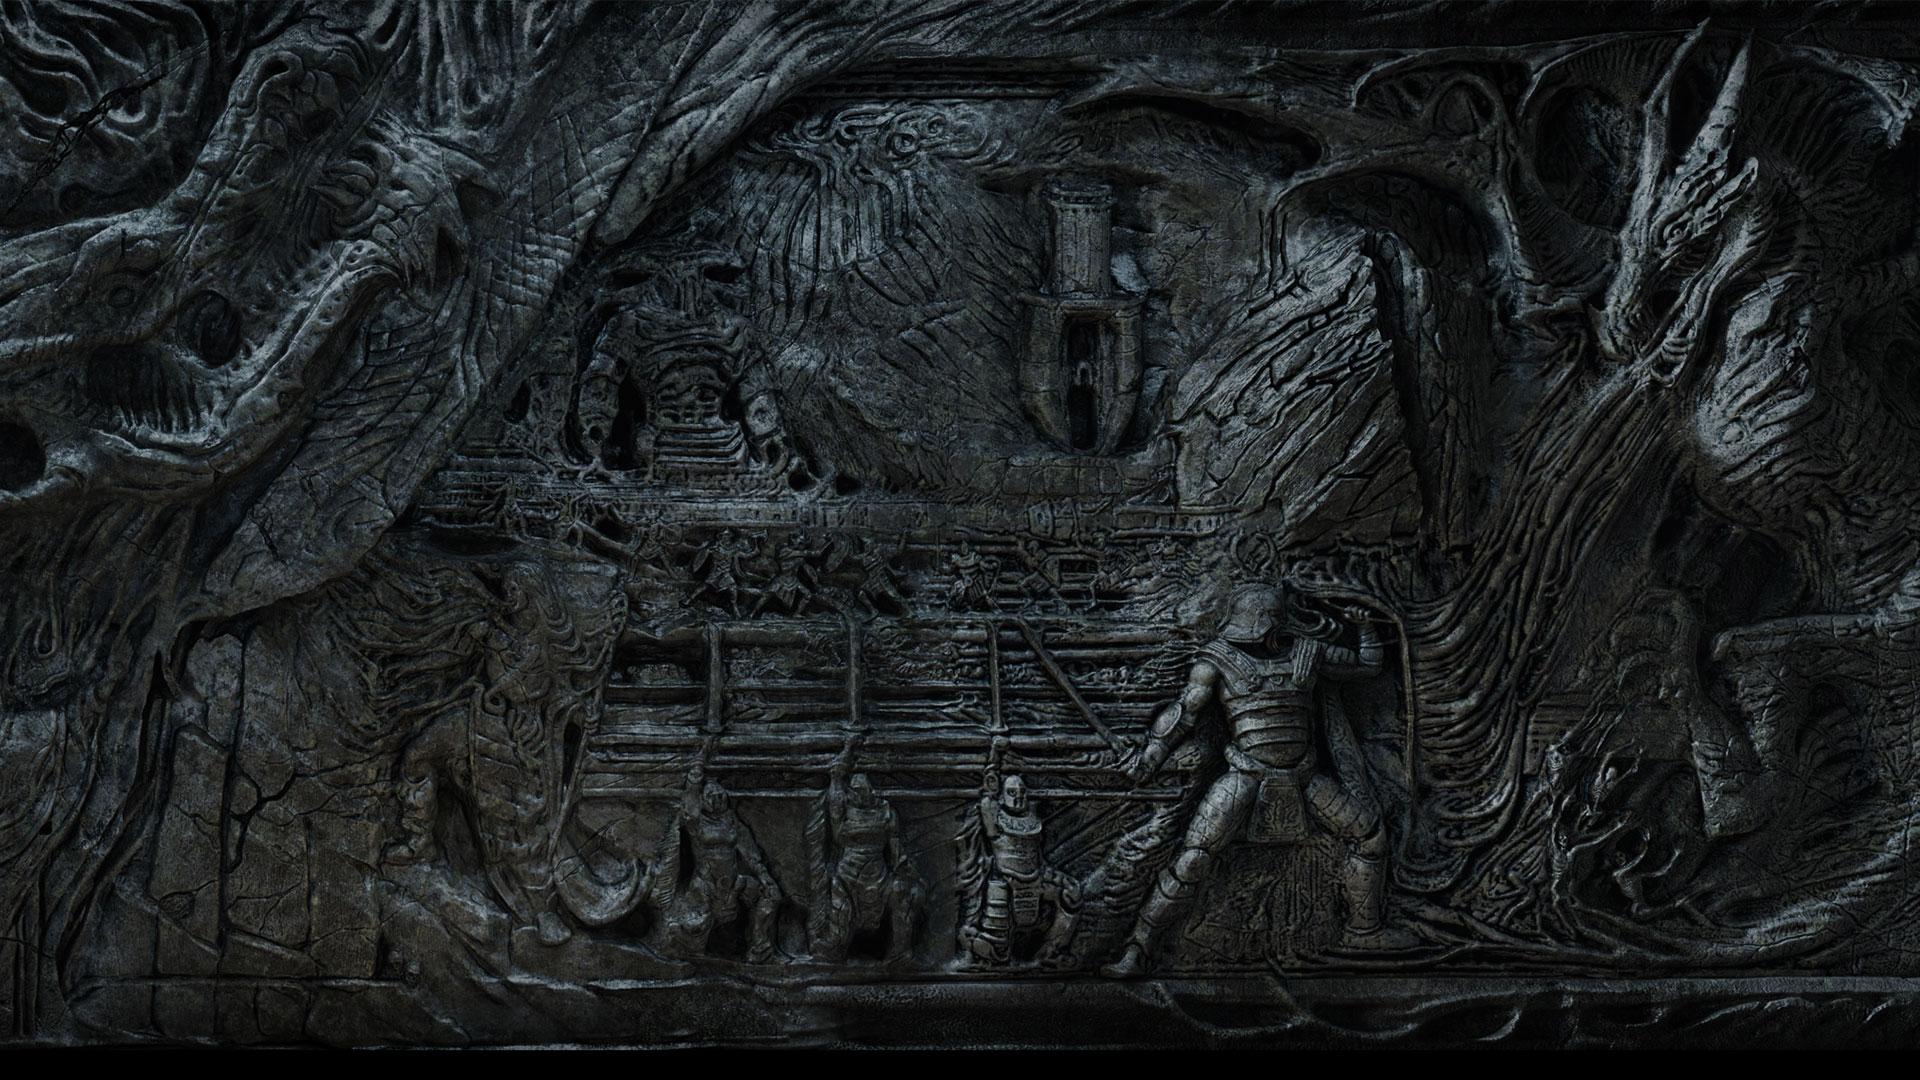 Elder Scrolls Skyrim 1080P Background Wallpaper - Wallpapers Kid